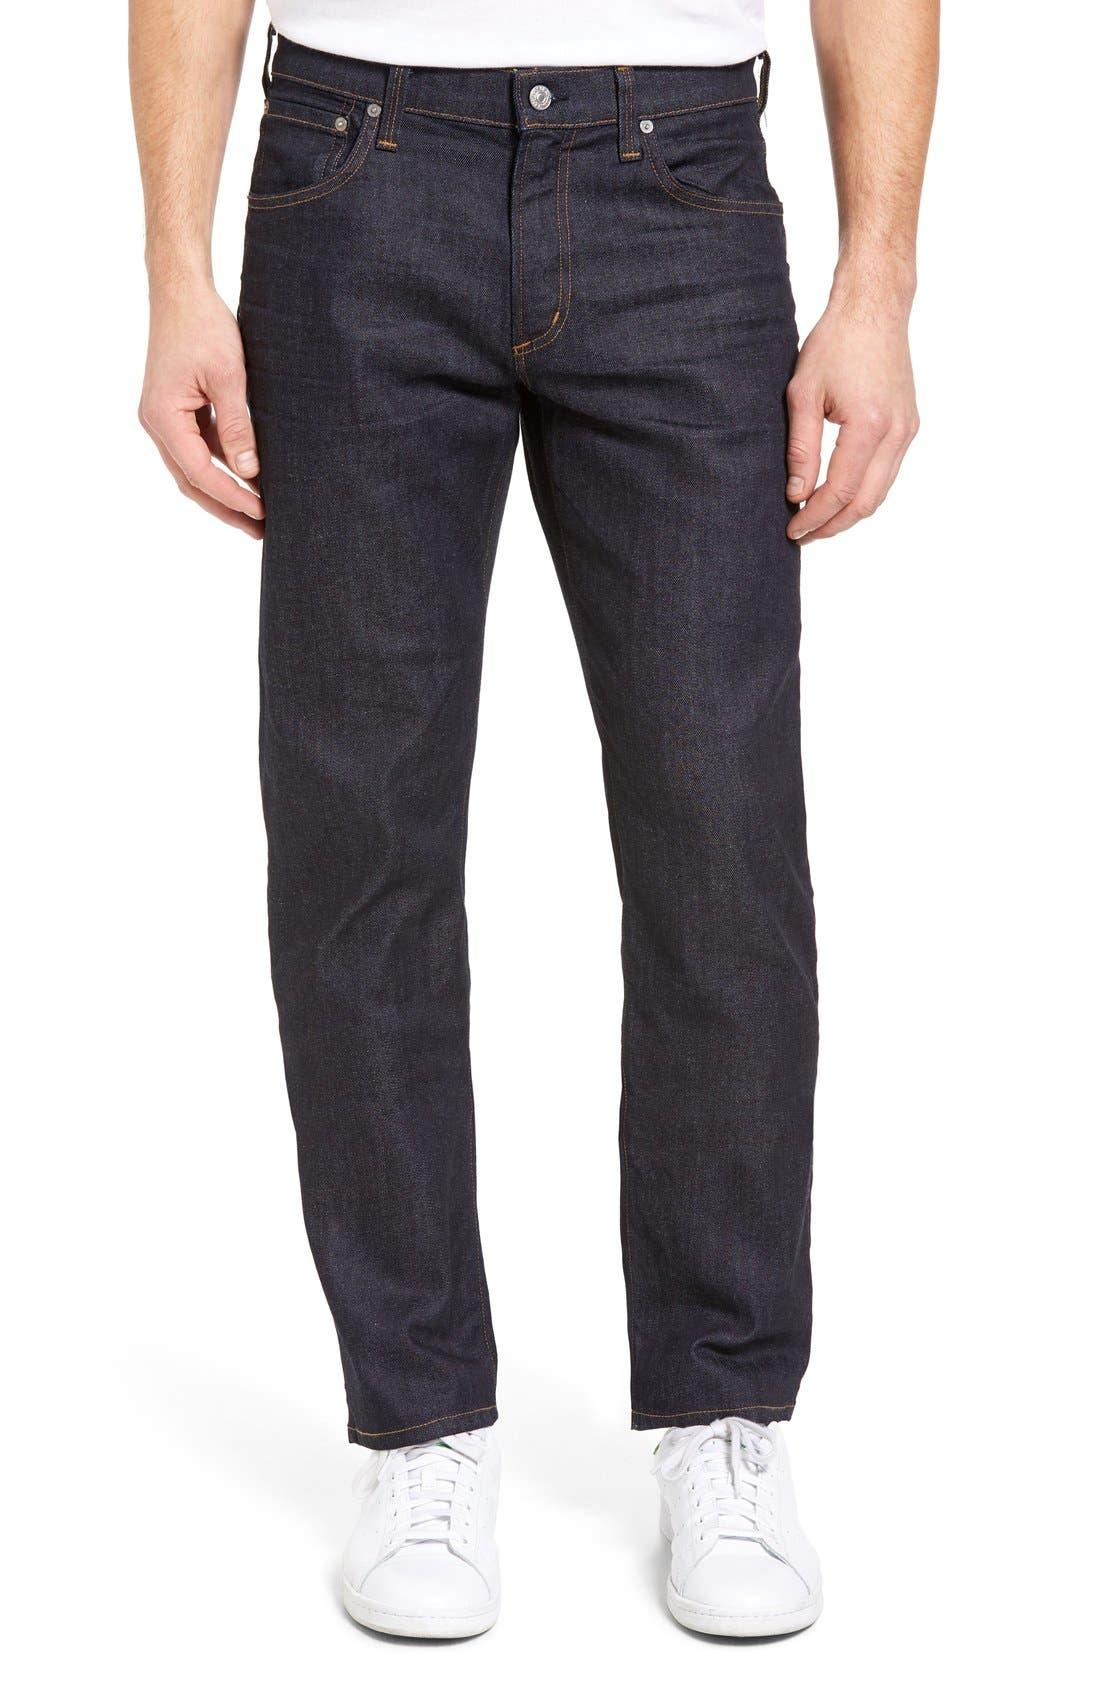 Sid Classic Straight Leg Jeans,                             Alternate thumbnail 12, color,                             LAFAYETTE